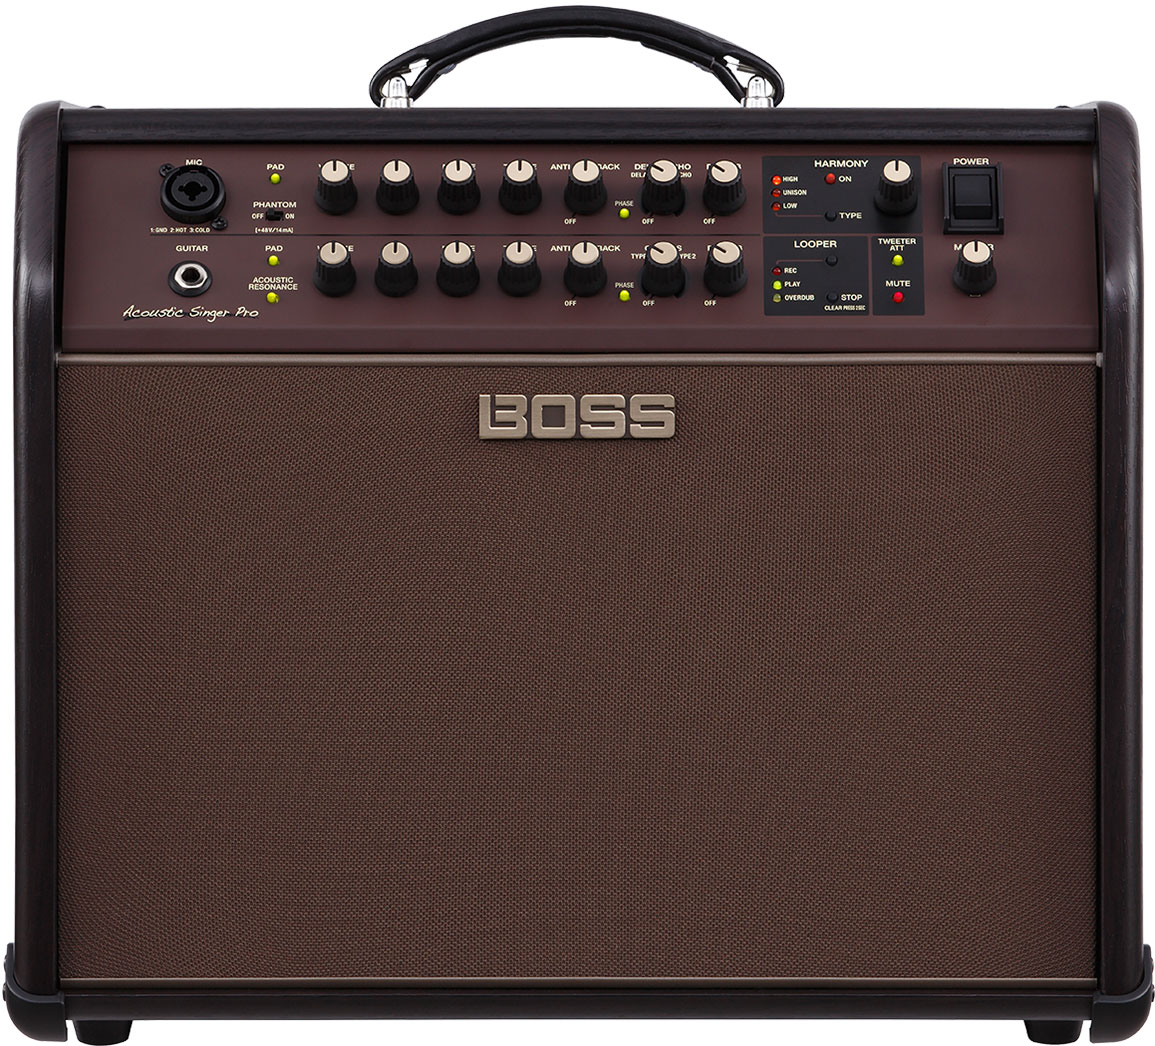 ampli guitar acoustic Boss ACS PRO